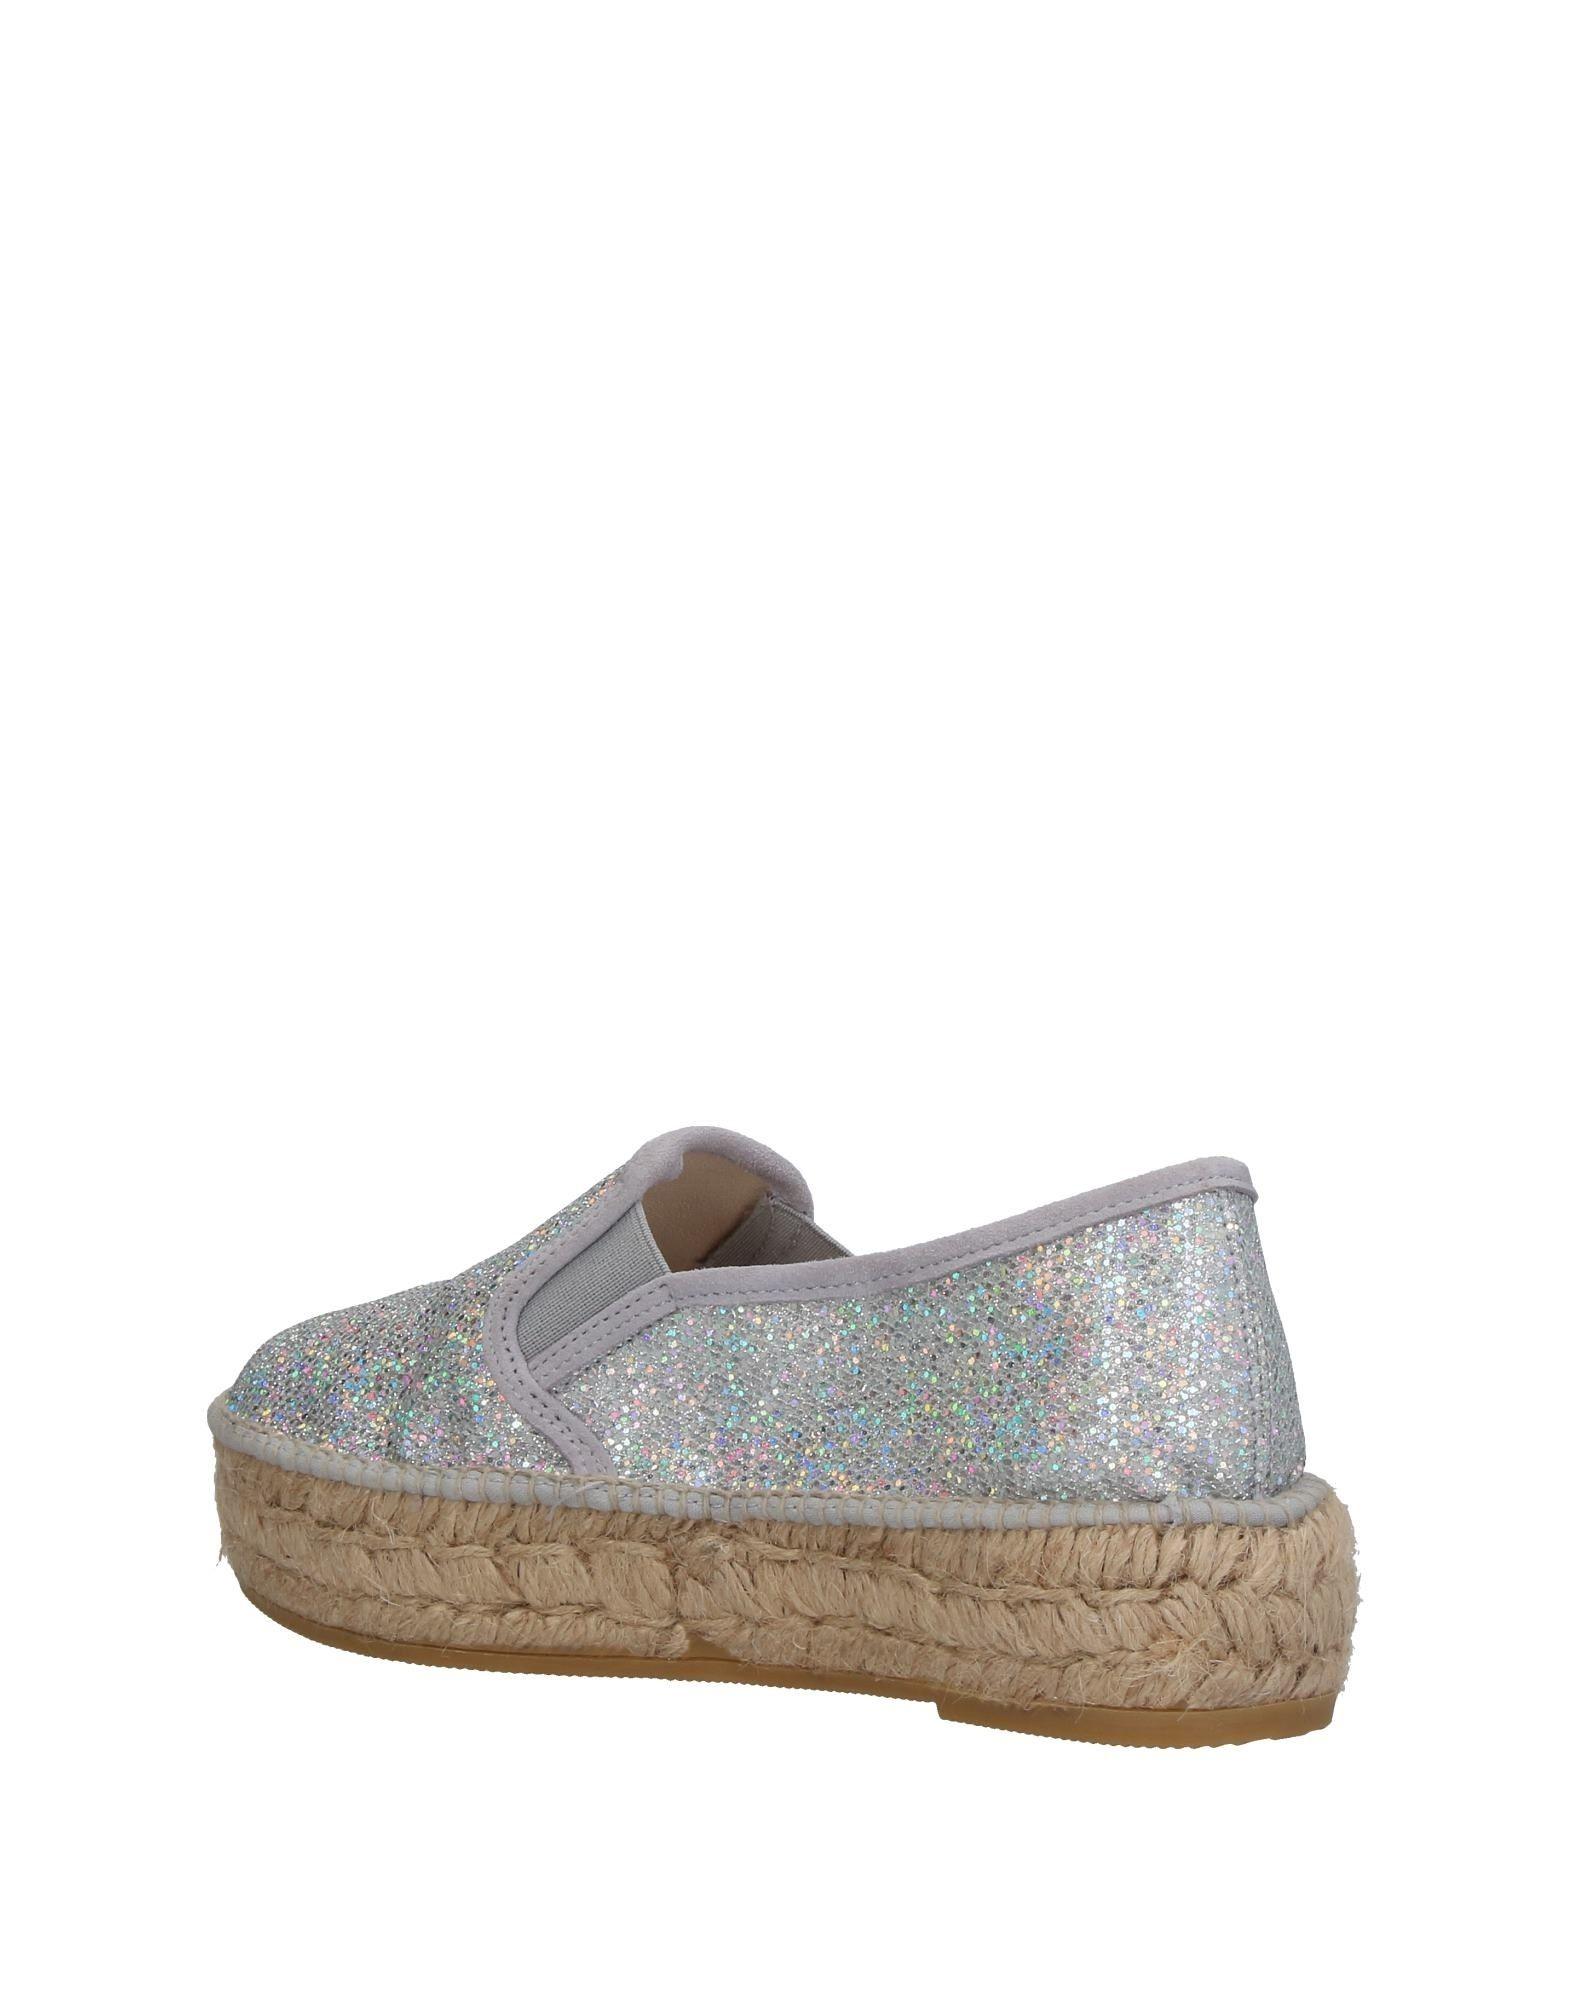 Espadrilles Heiße Espadrilles Damen  11409985CS Heiße Espadrilles Schuhe a5b44f